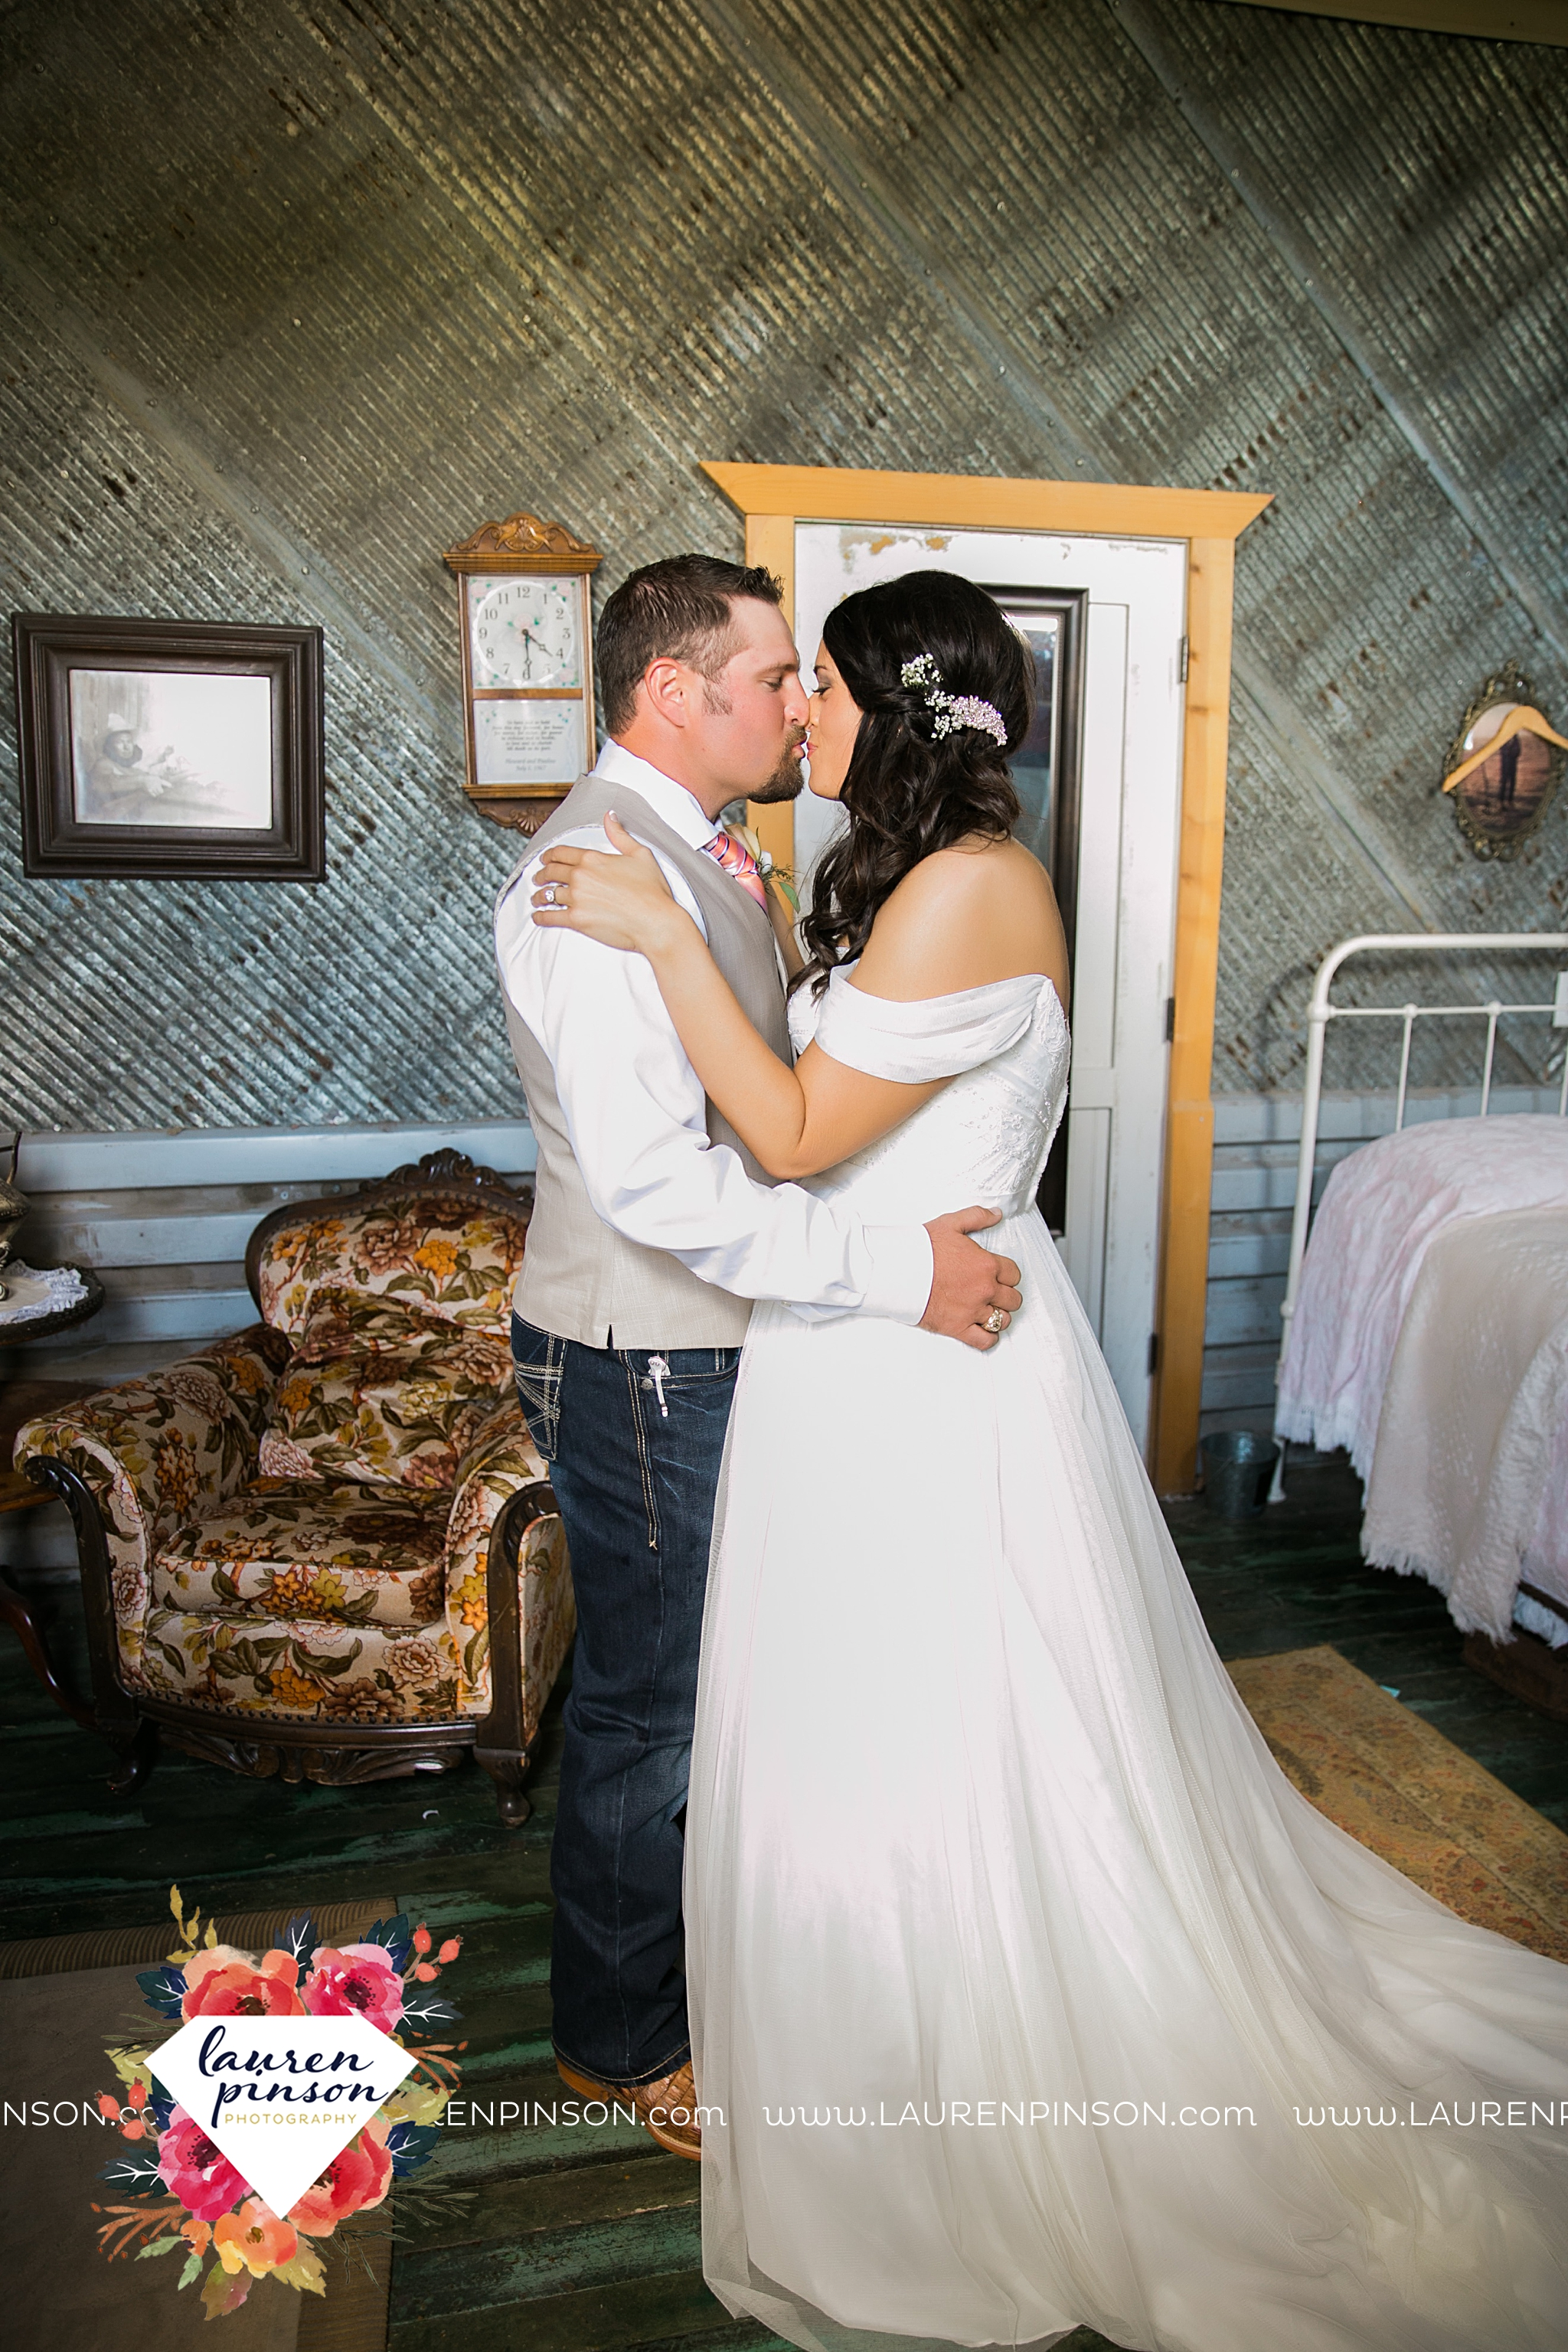 jones-barn-willow-creek-ranch-wedding-in-cleburne-texas-fort-worth-dfw-wichita-falls-wedding-photography_3201.jpg